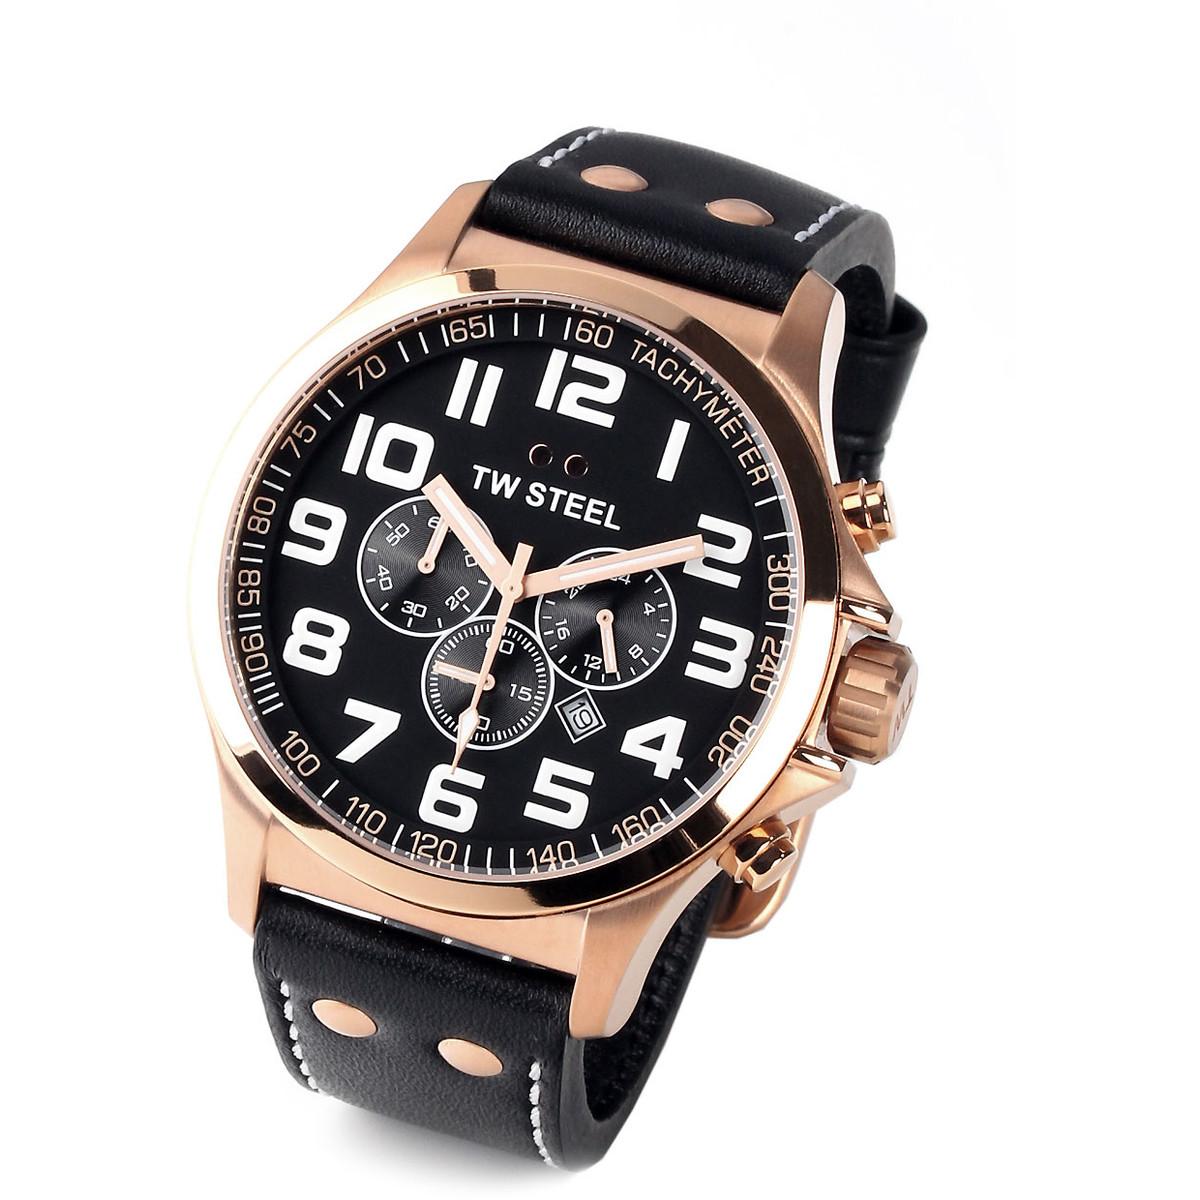 Ceas barbatesc TW-Steel Pilot TW418 Cronograph de mana original